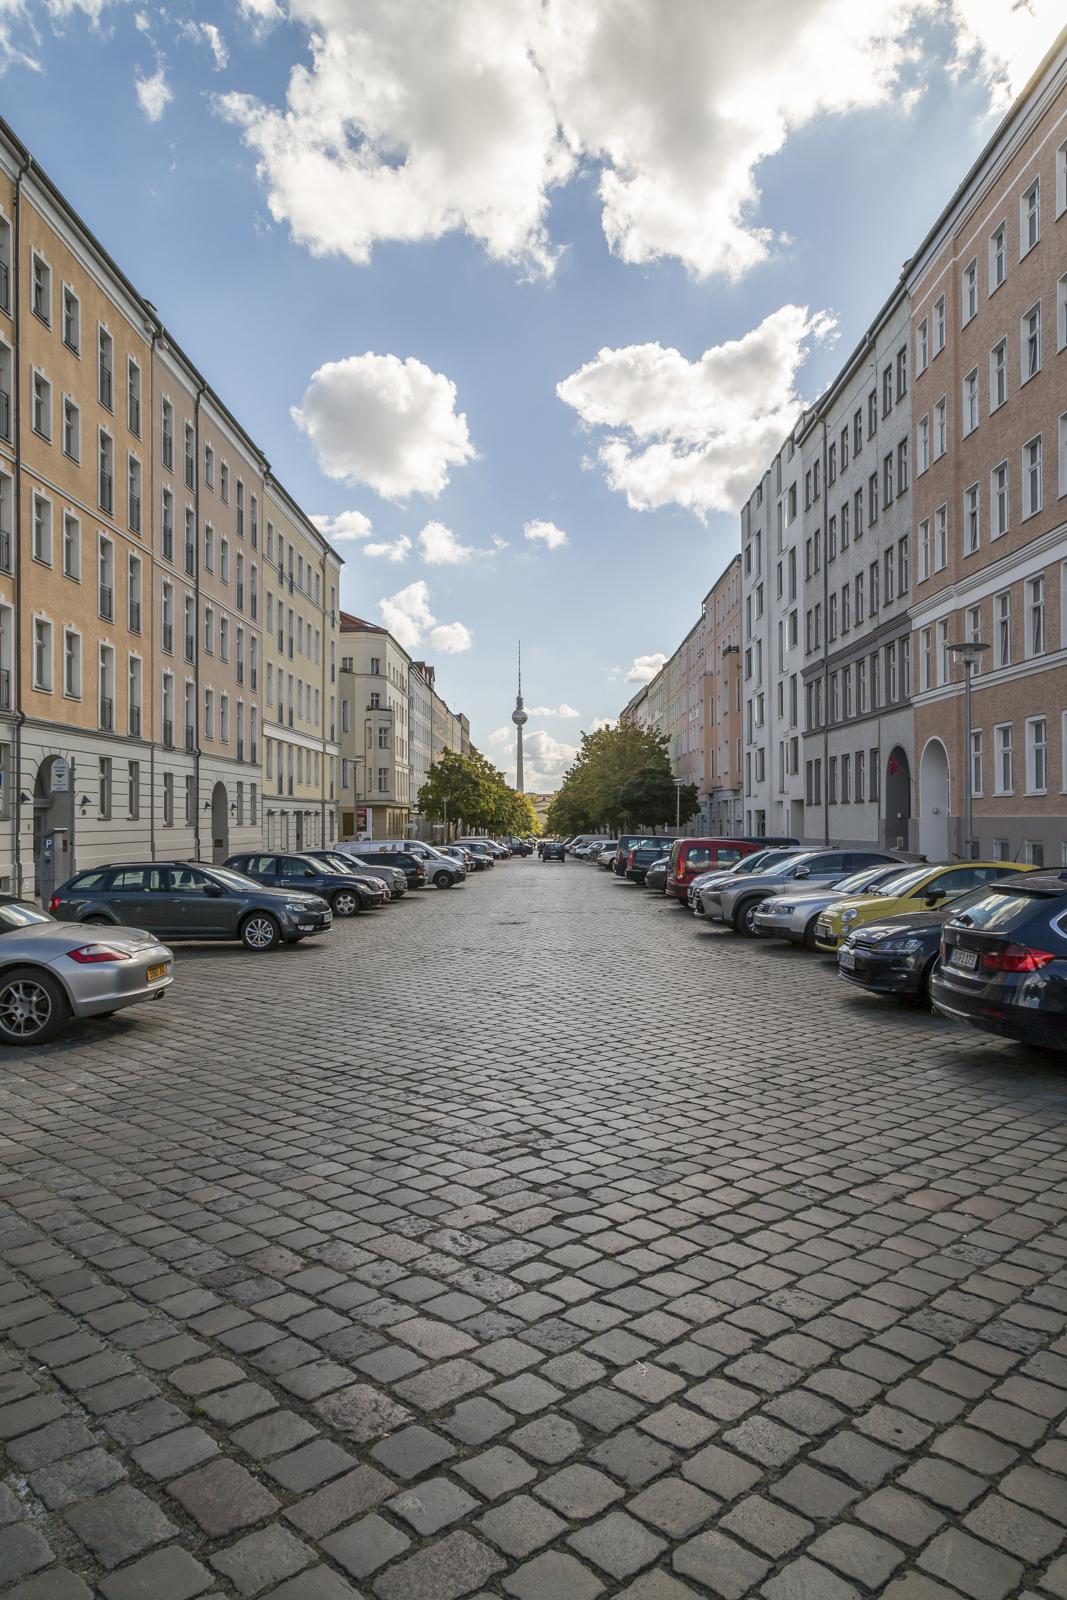 Ingo_Lawaczeck_Mähren_Strelitzer_Straße-3